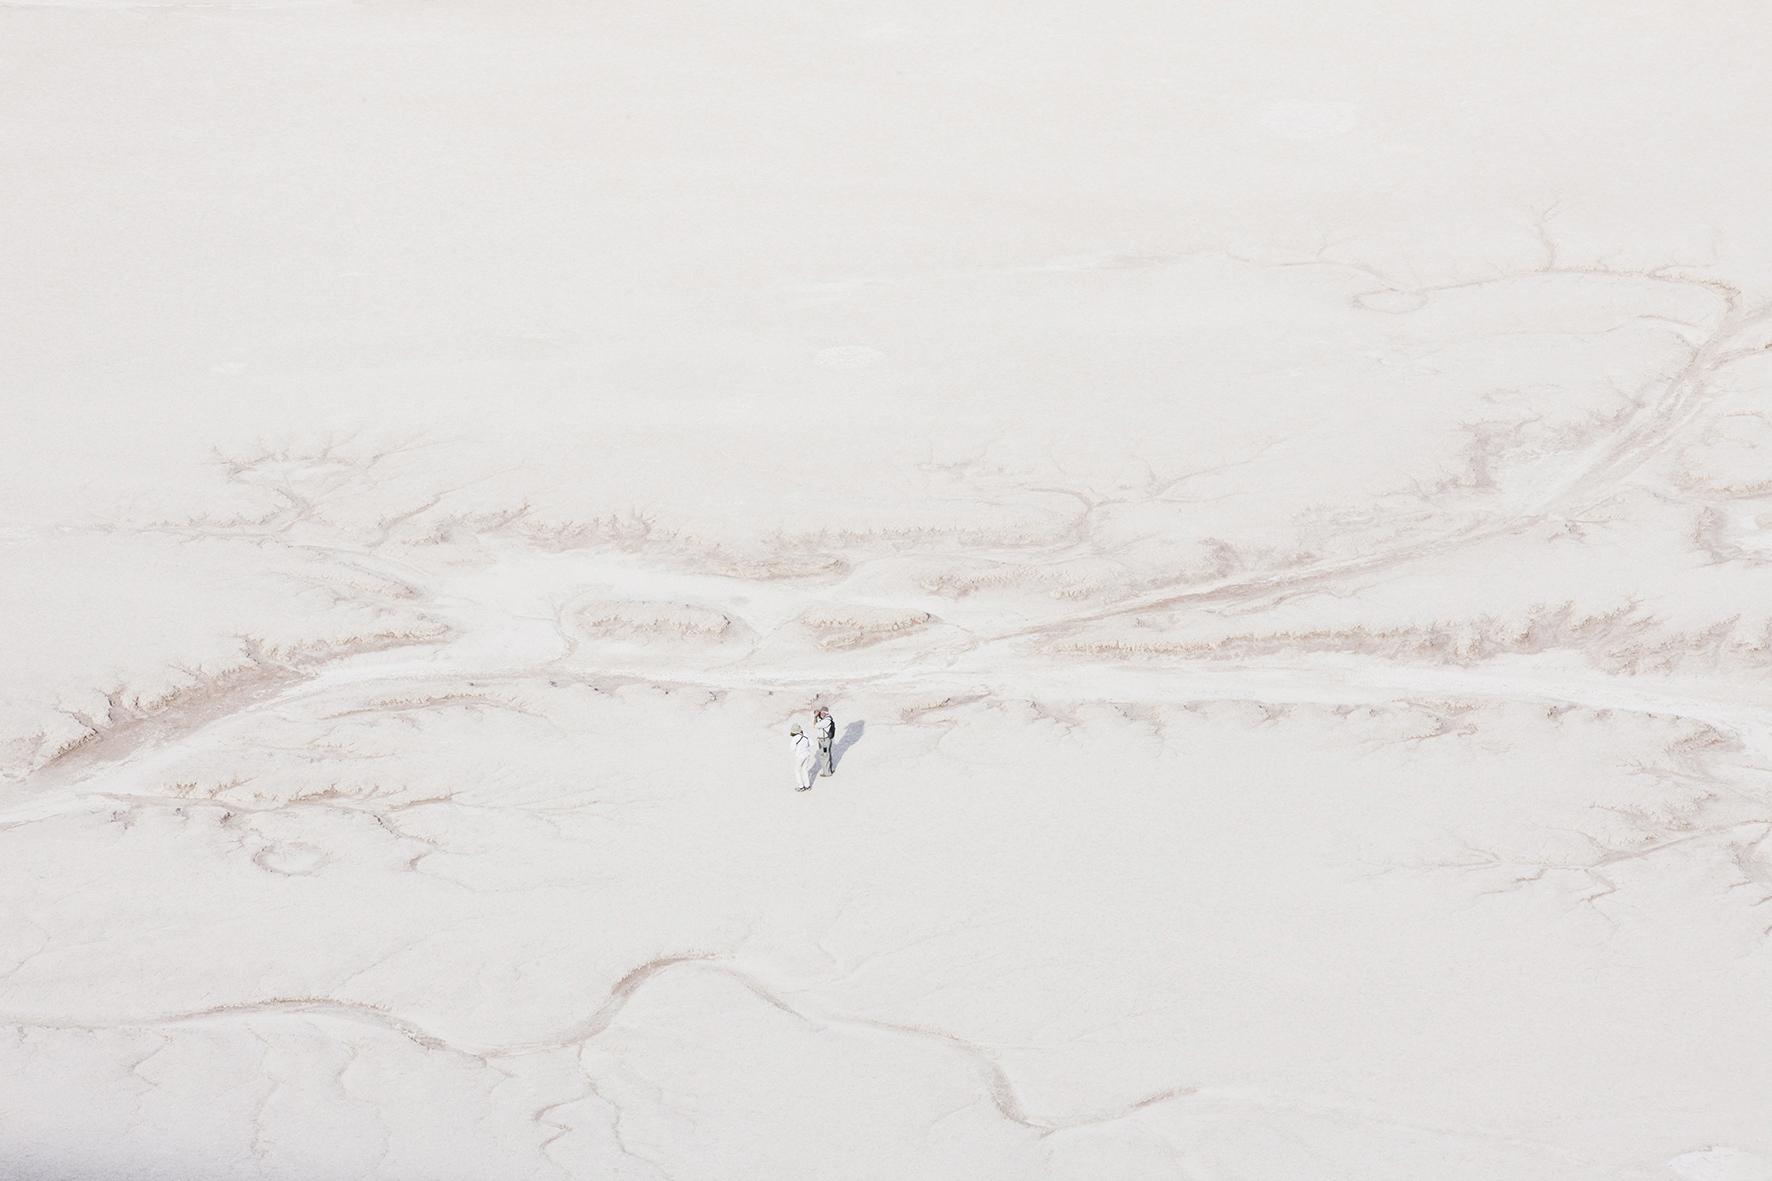 m- Lavigne, Swirl, Namibia, 2015